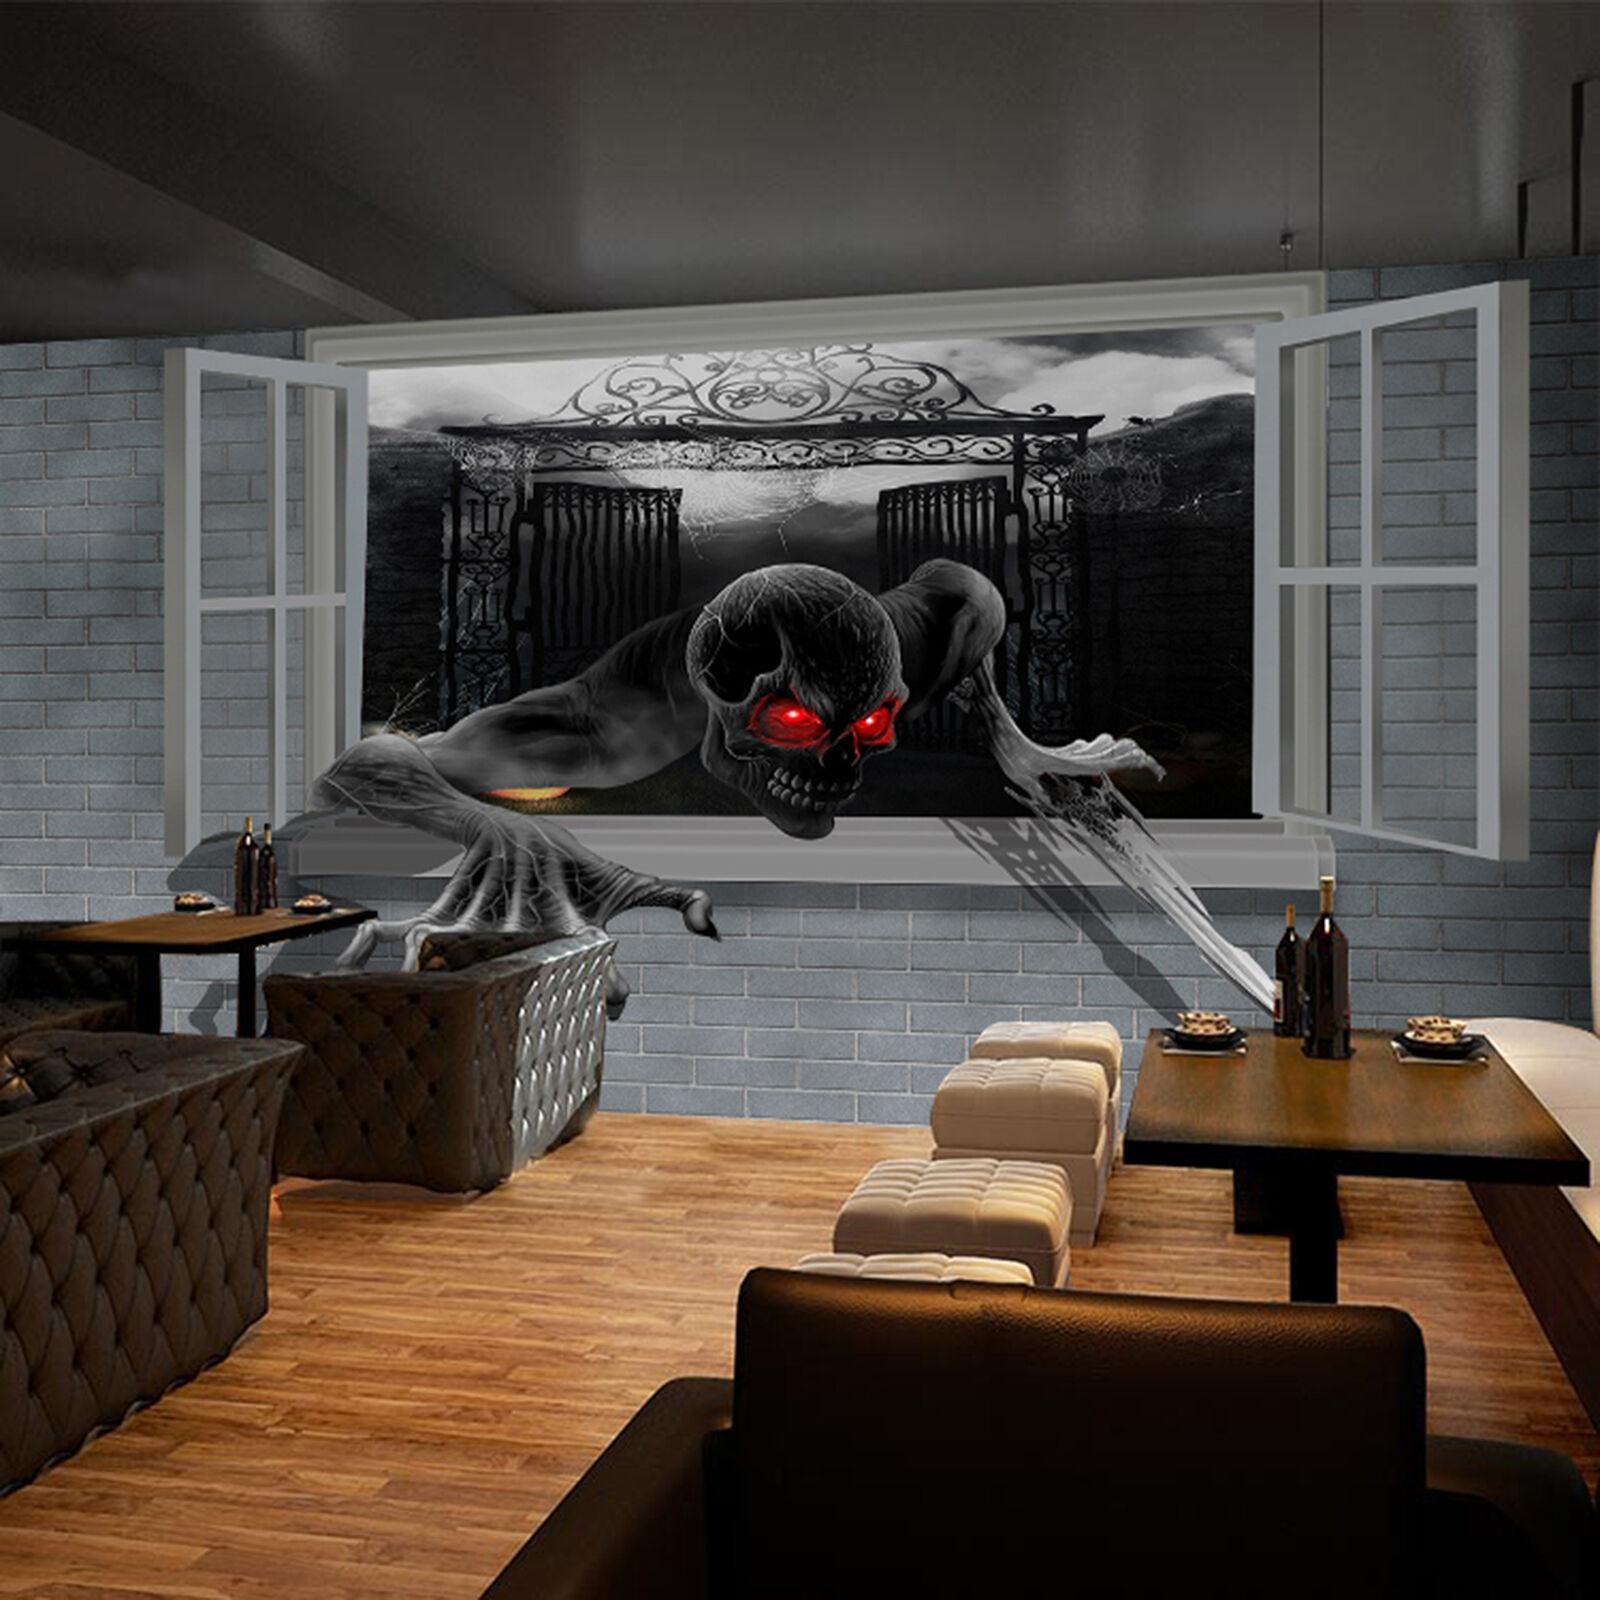 3D Der Teufel 433 Fototapeten Wandbild Fototapete Bild Tapete Familie Kinder DE